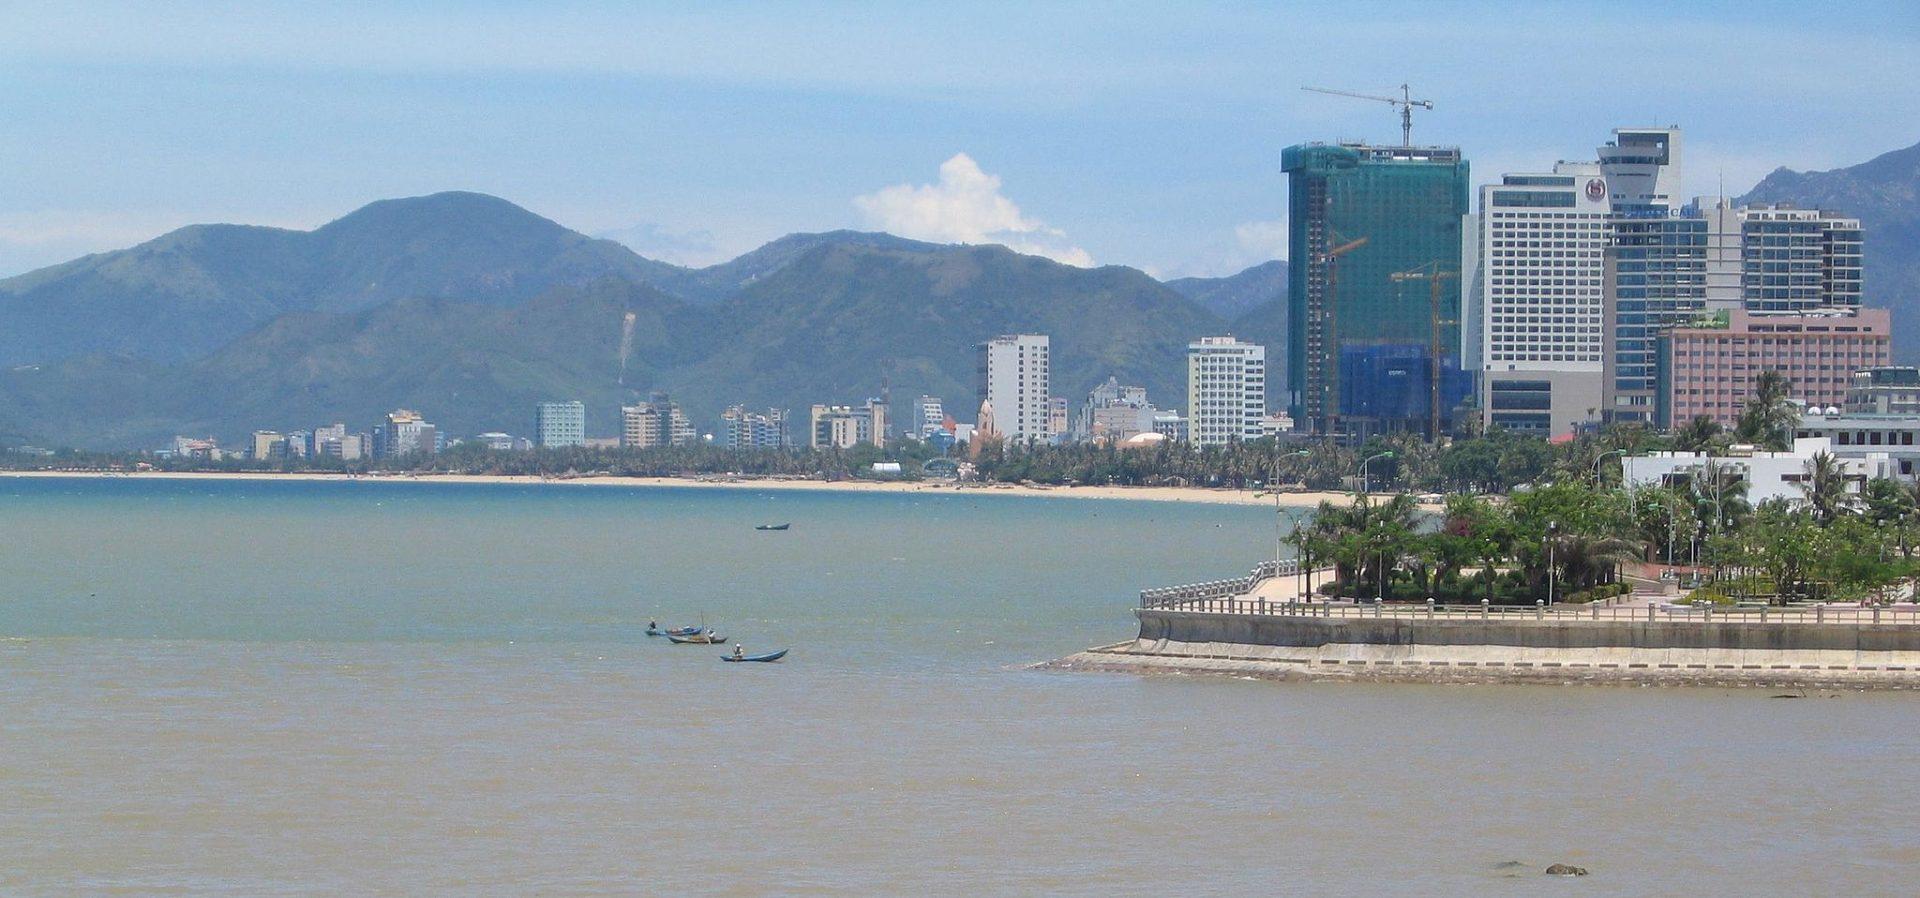 Nha Trang skyline/kenner116